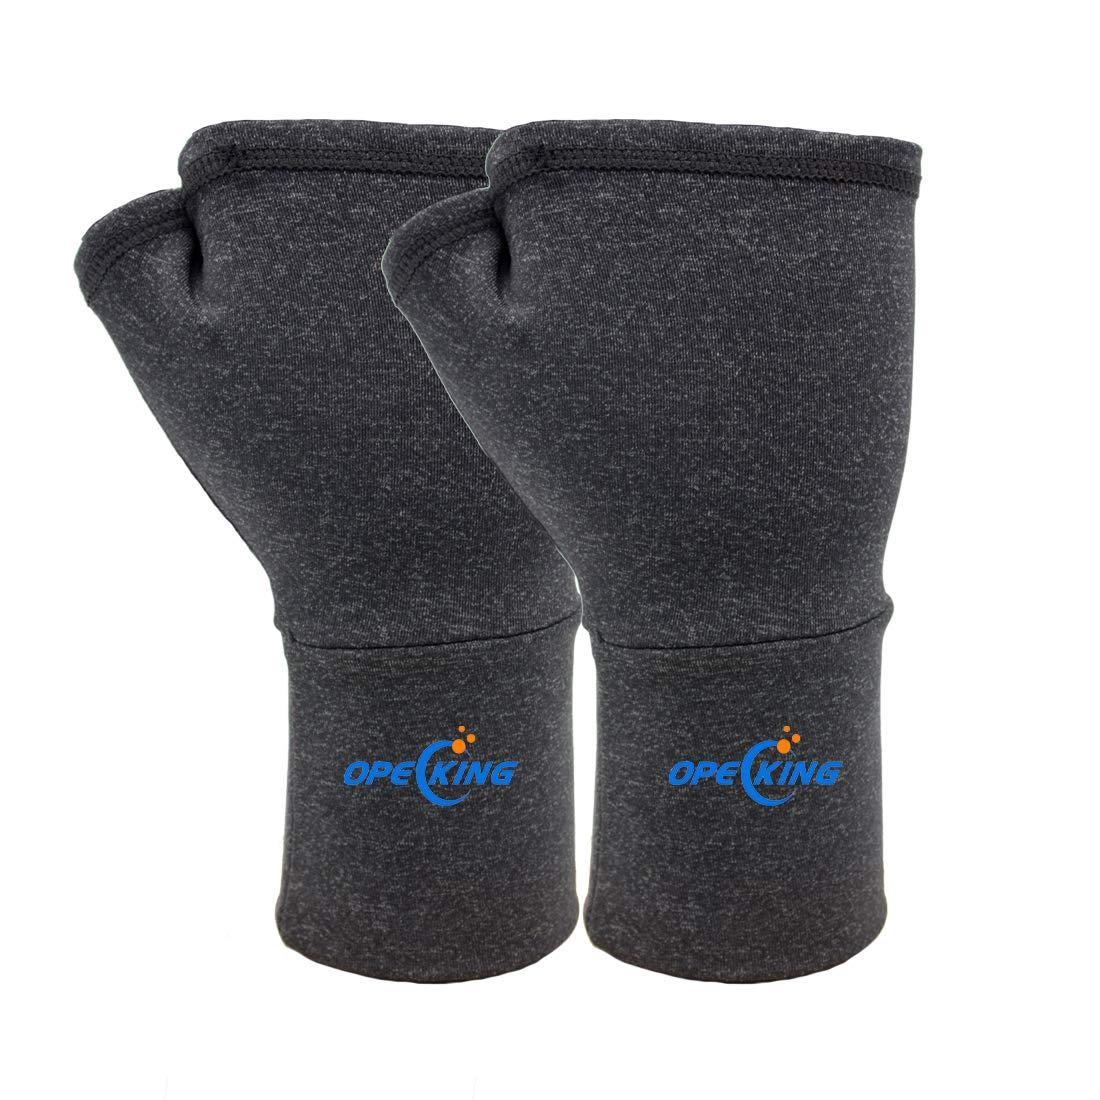 Wrist Brace for Carpal Tunnel,Support Brace for Arthritis, Osteoarthritis, Swelling, Inflammation, Weightlifting Men & Women (1 Pair) - Medium